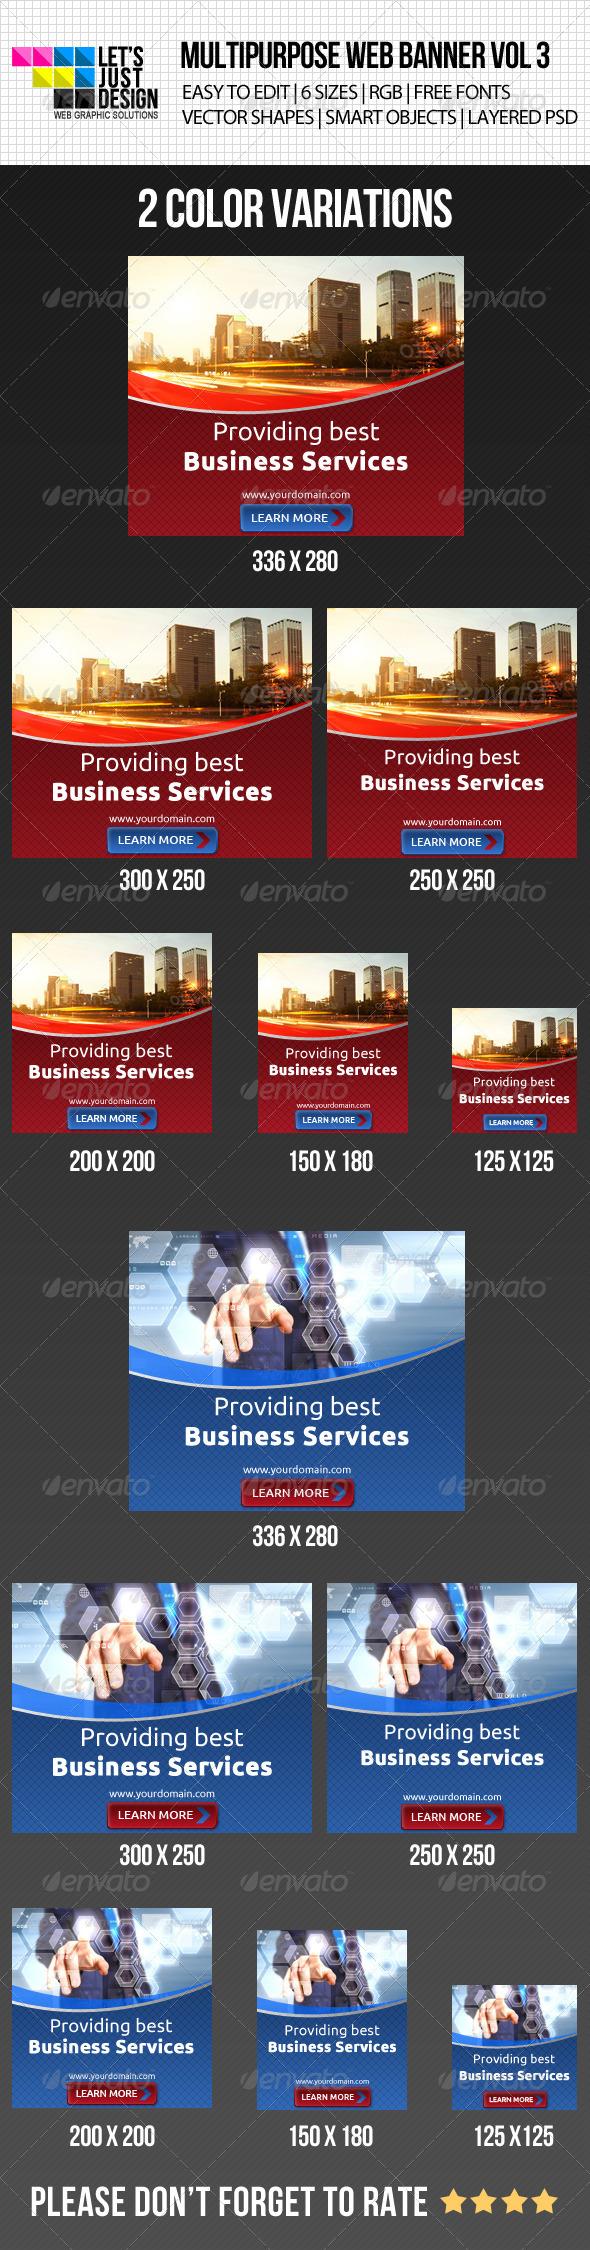 Creative Multipurpose Web Banner Vol 3 - Banners & Ads Web Elements